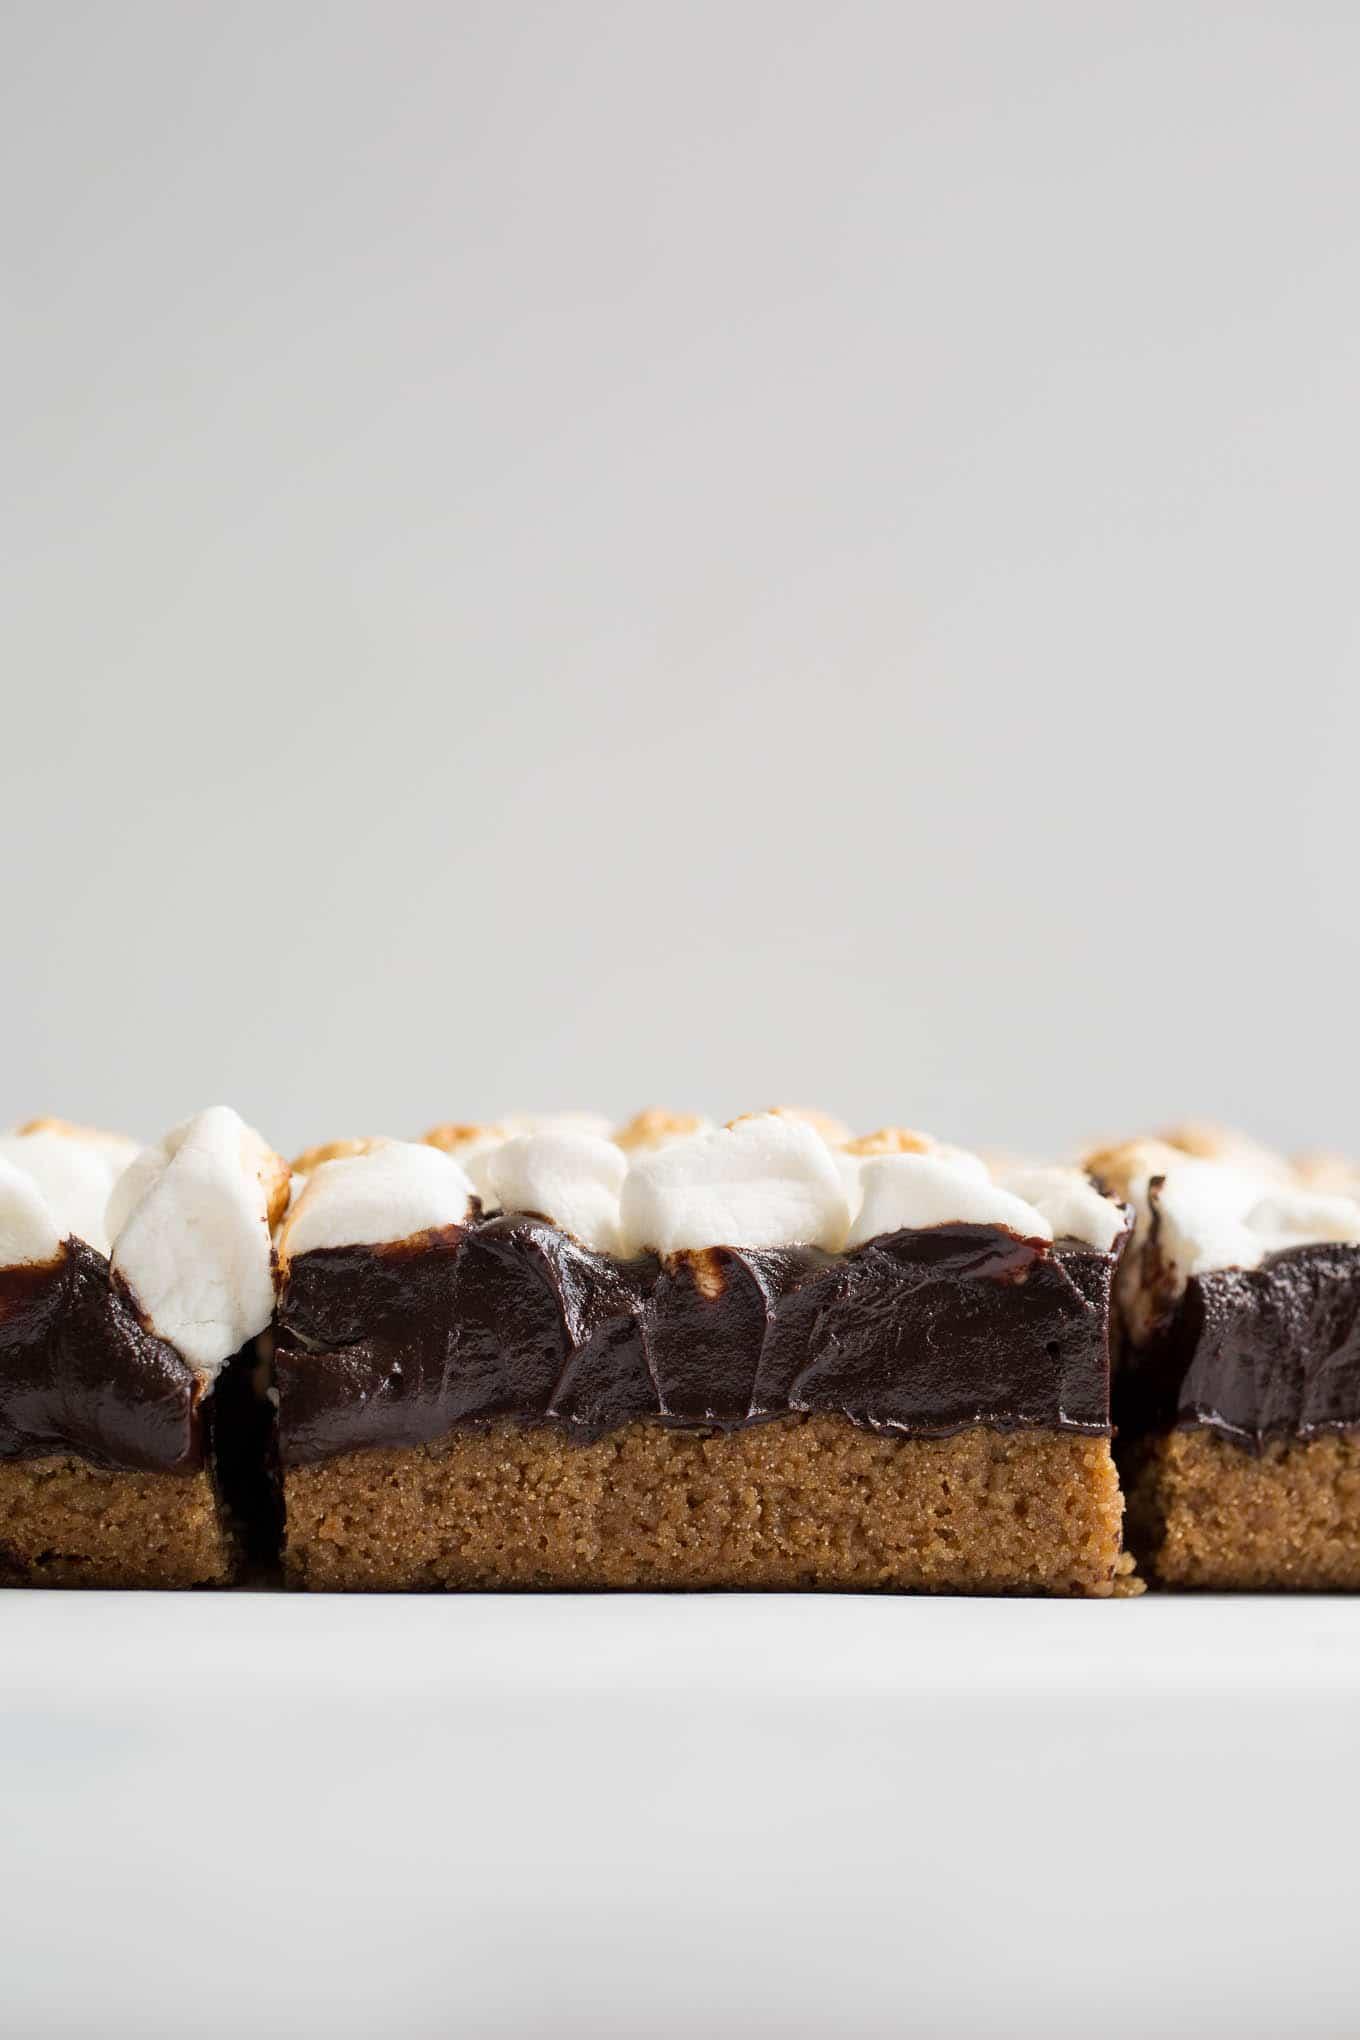 Gluten-Free S'mores Bars (Vegan) | saltedplains.com